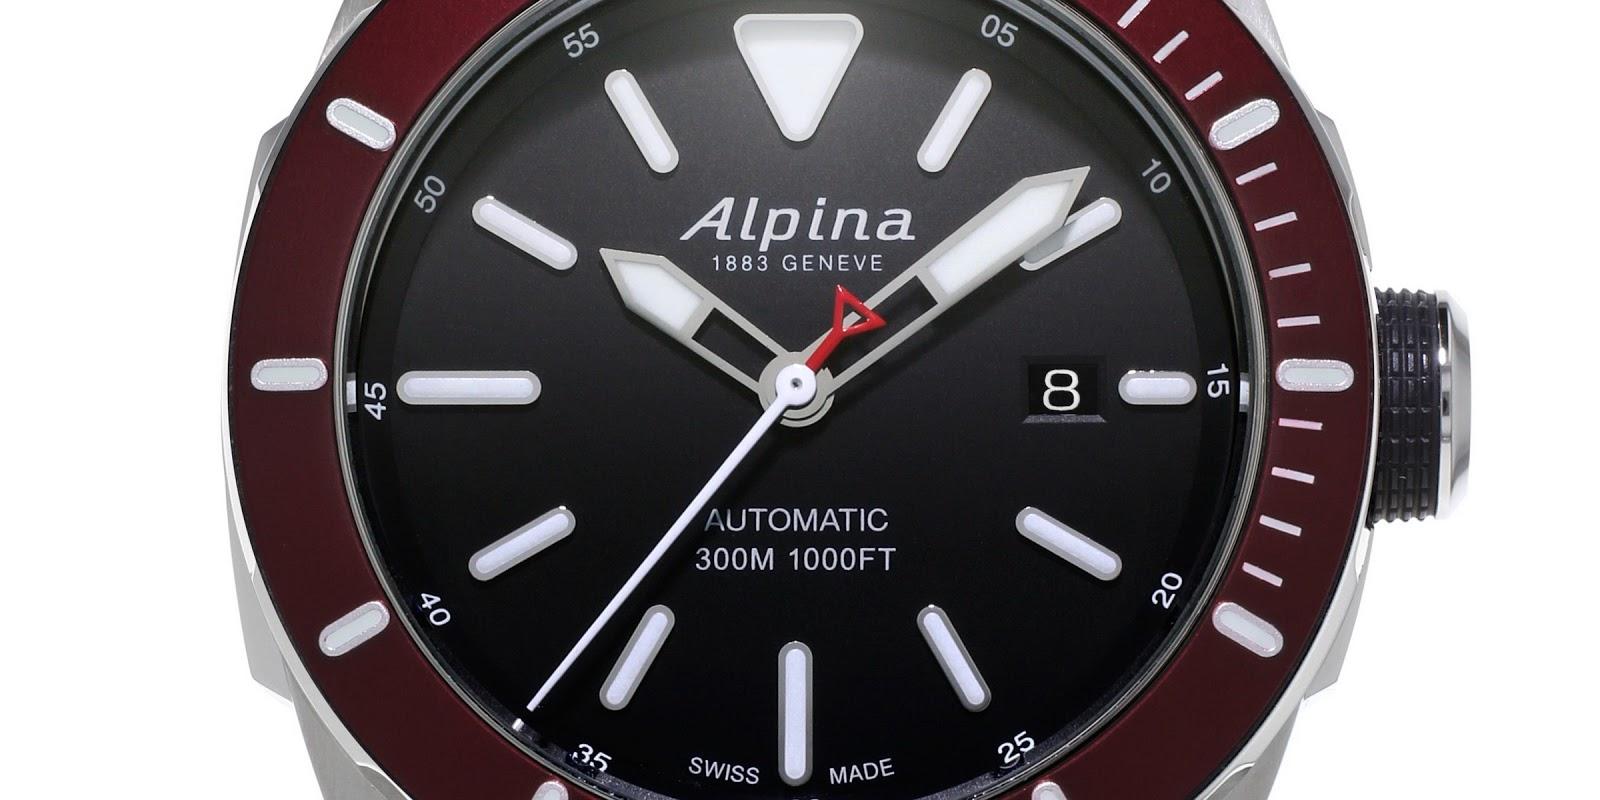 ALPINA Seastrong Diver AUTO Luxury Watches - Alpina diver